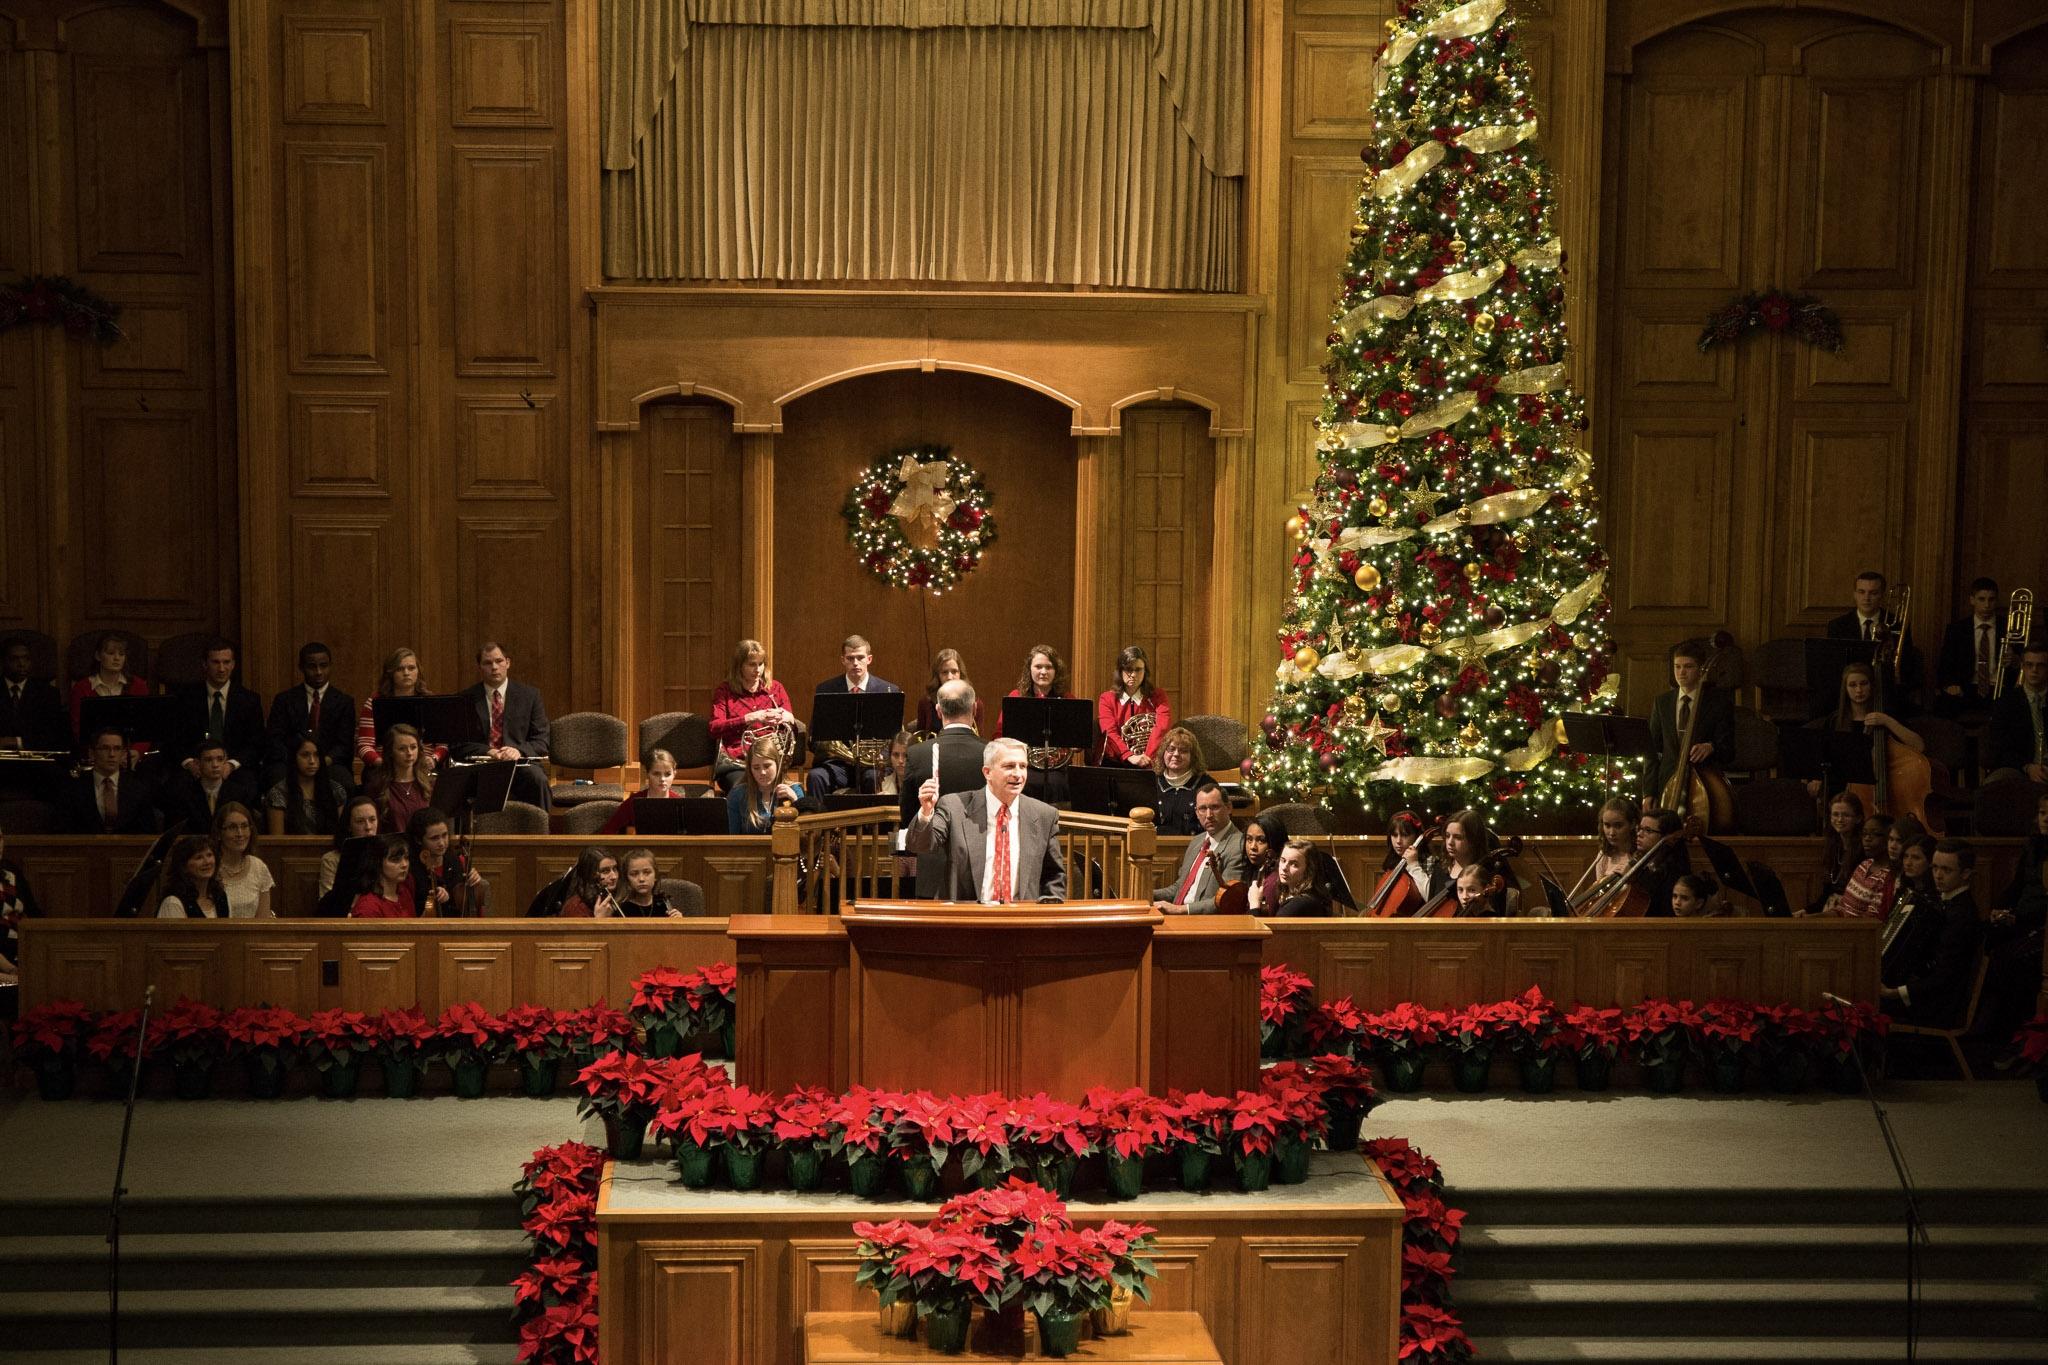 Religious Christmas Music.Fairhaven Baptist Church Christmas Music Night 2017 1 Of 43